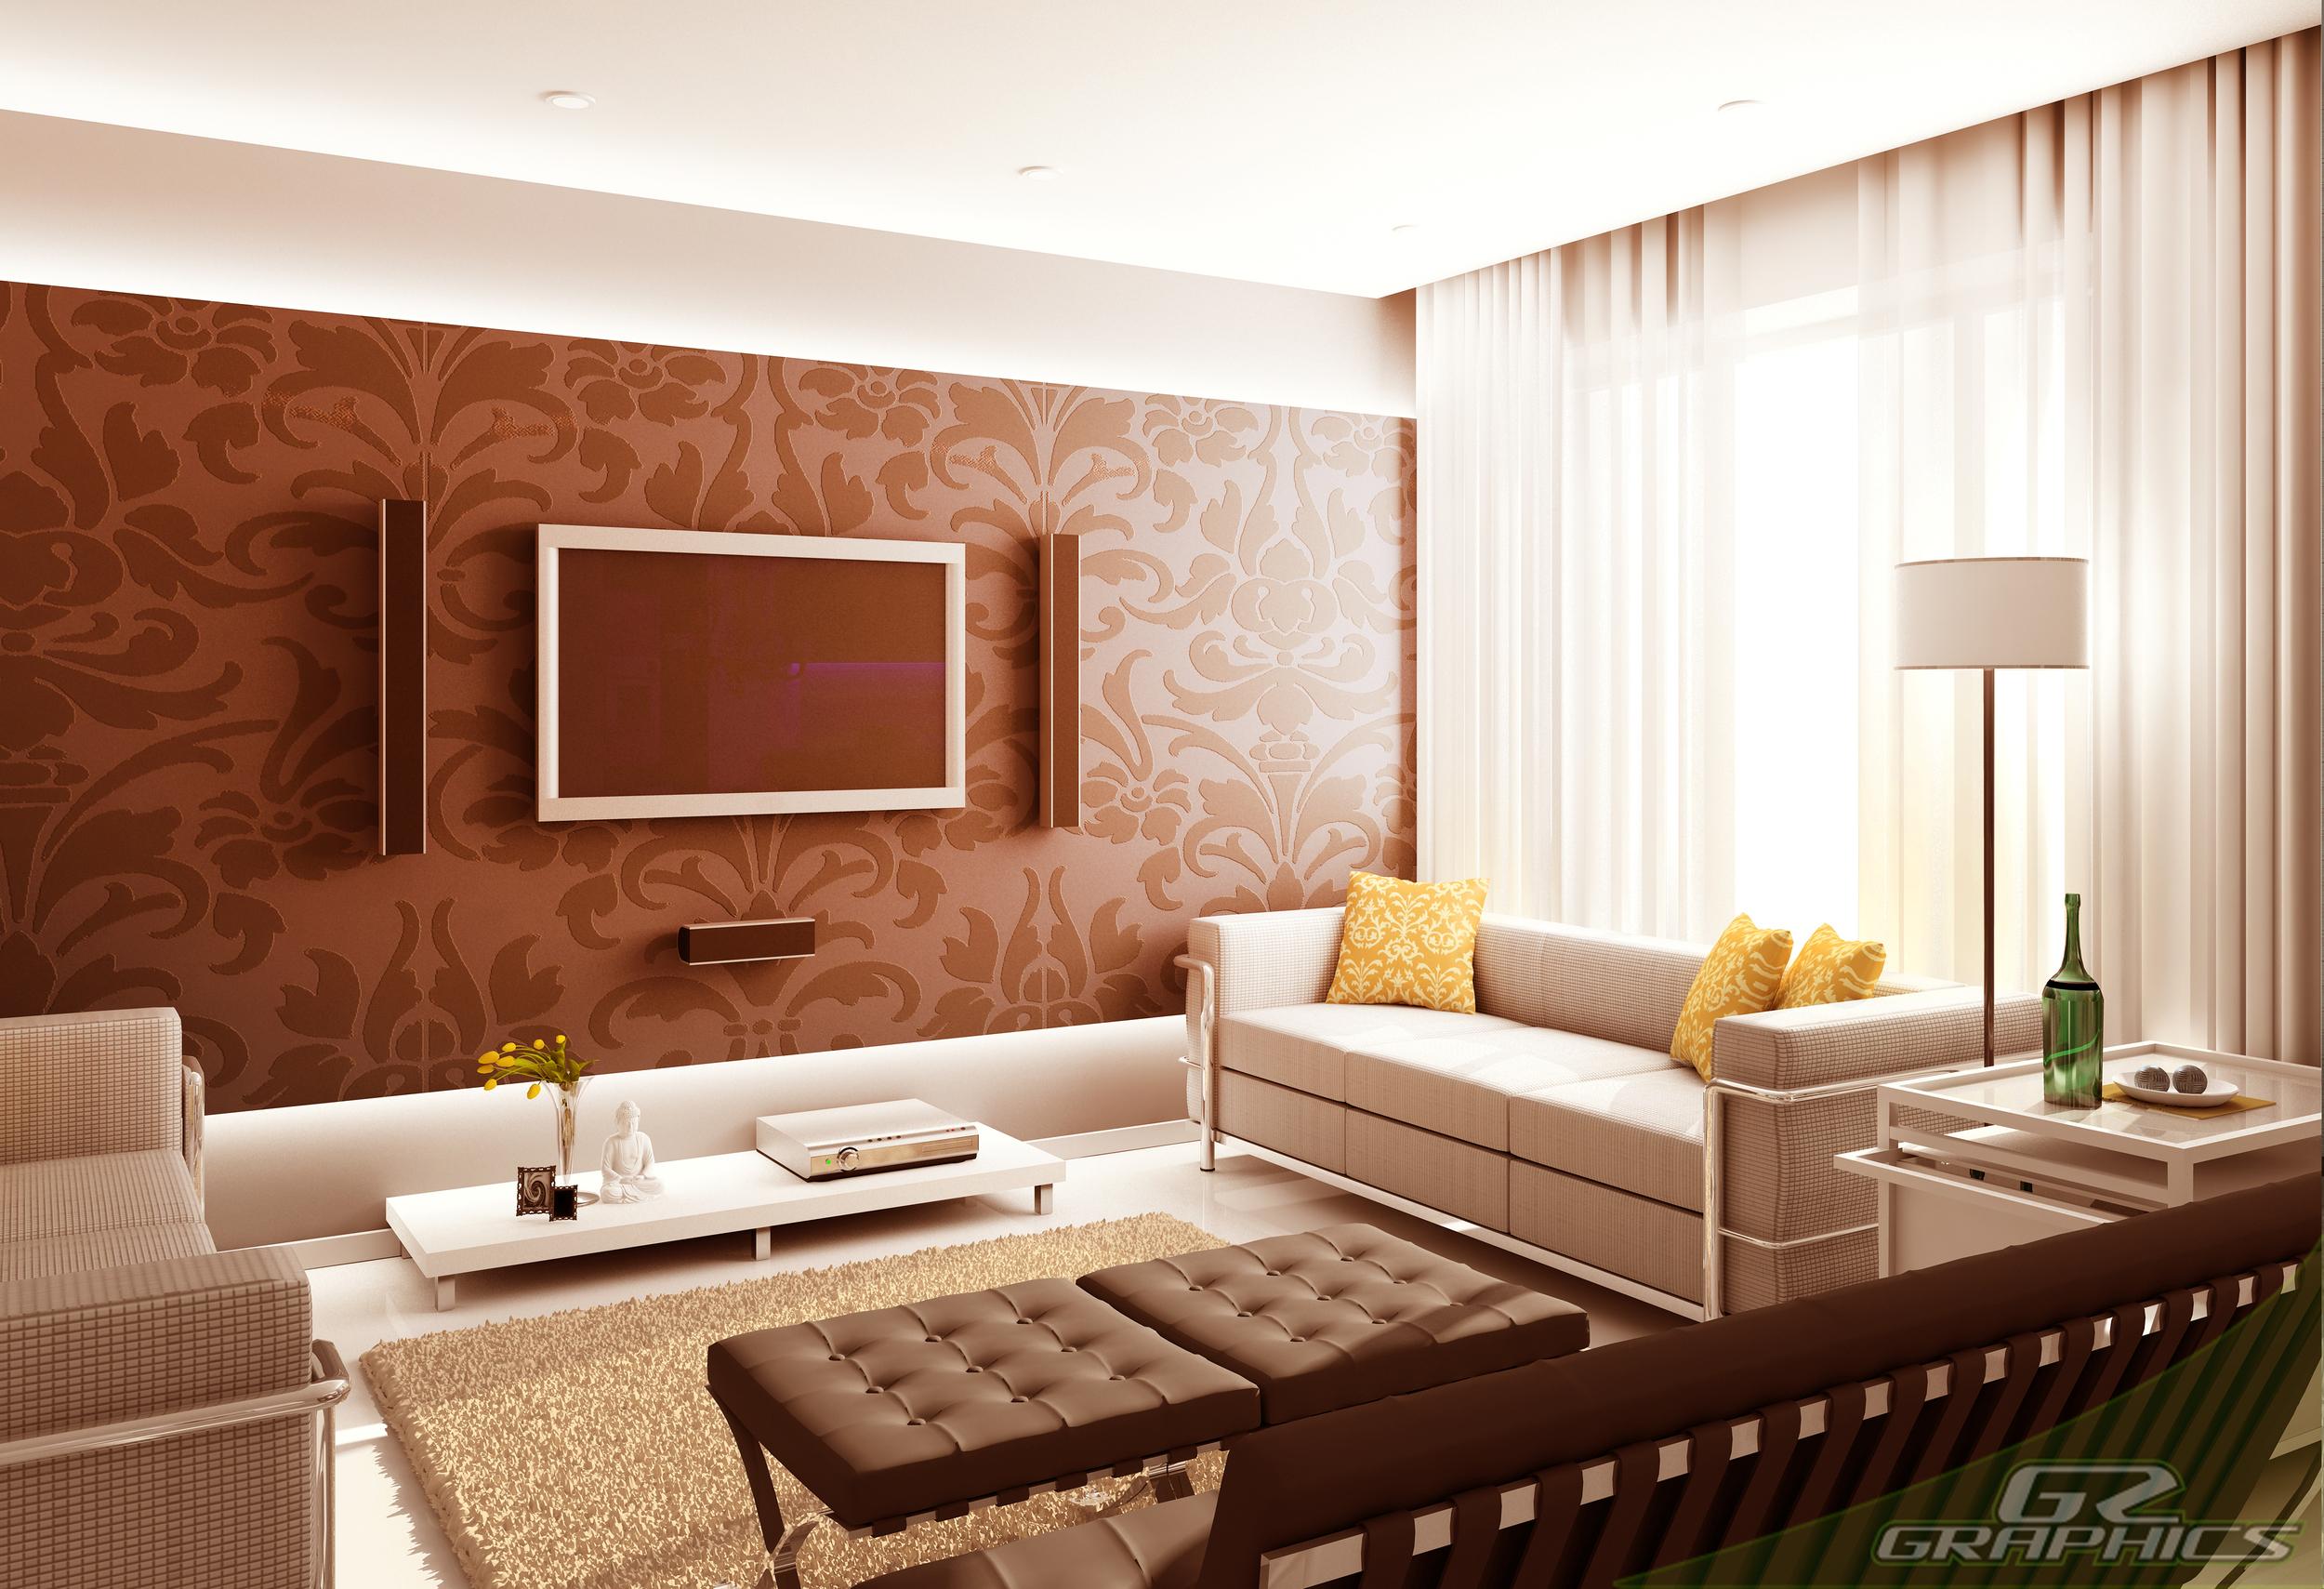 wall graphics idea 5.jpg